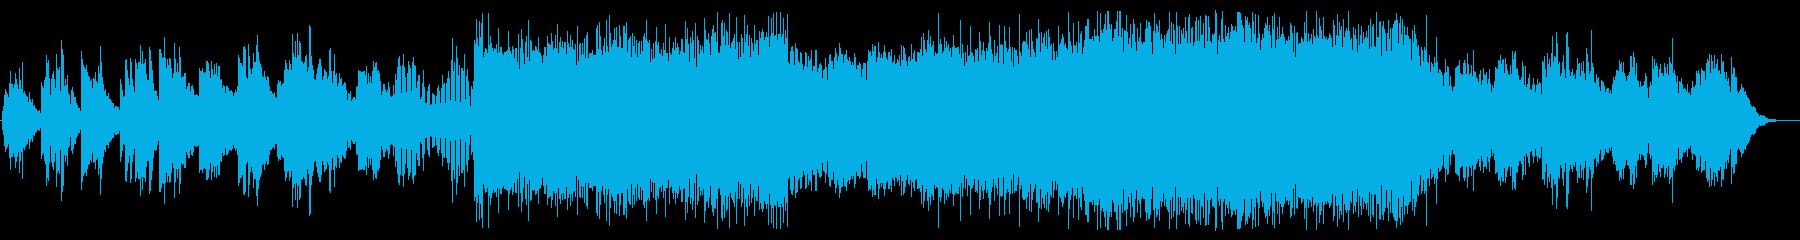 X-Filesのようなサスペンステクノの再生済みの波形